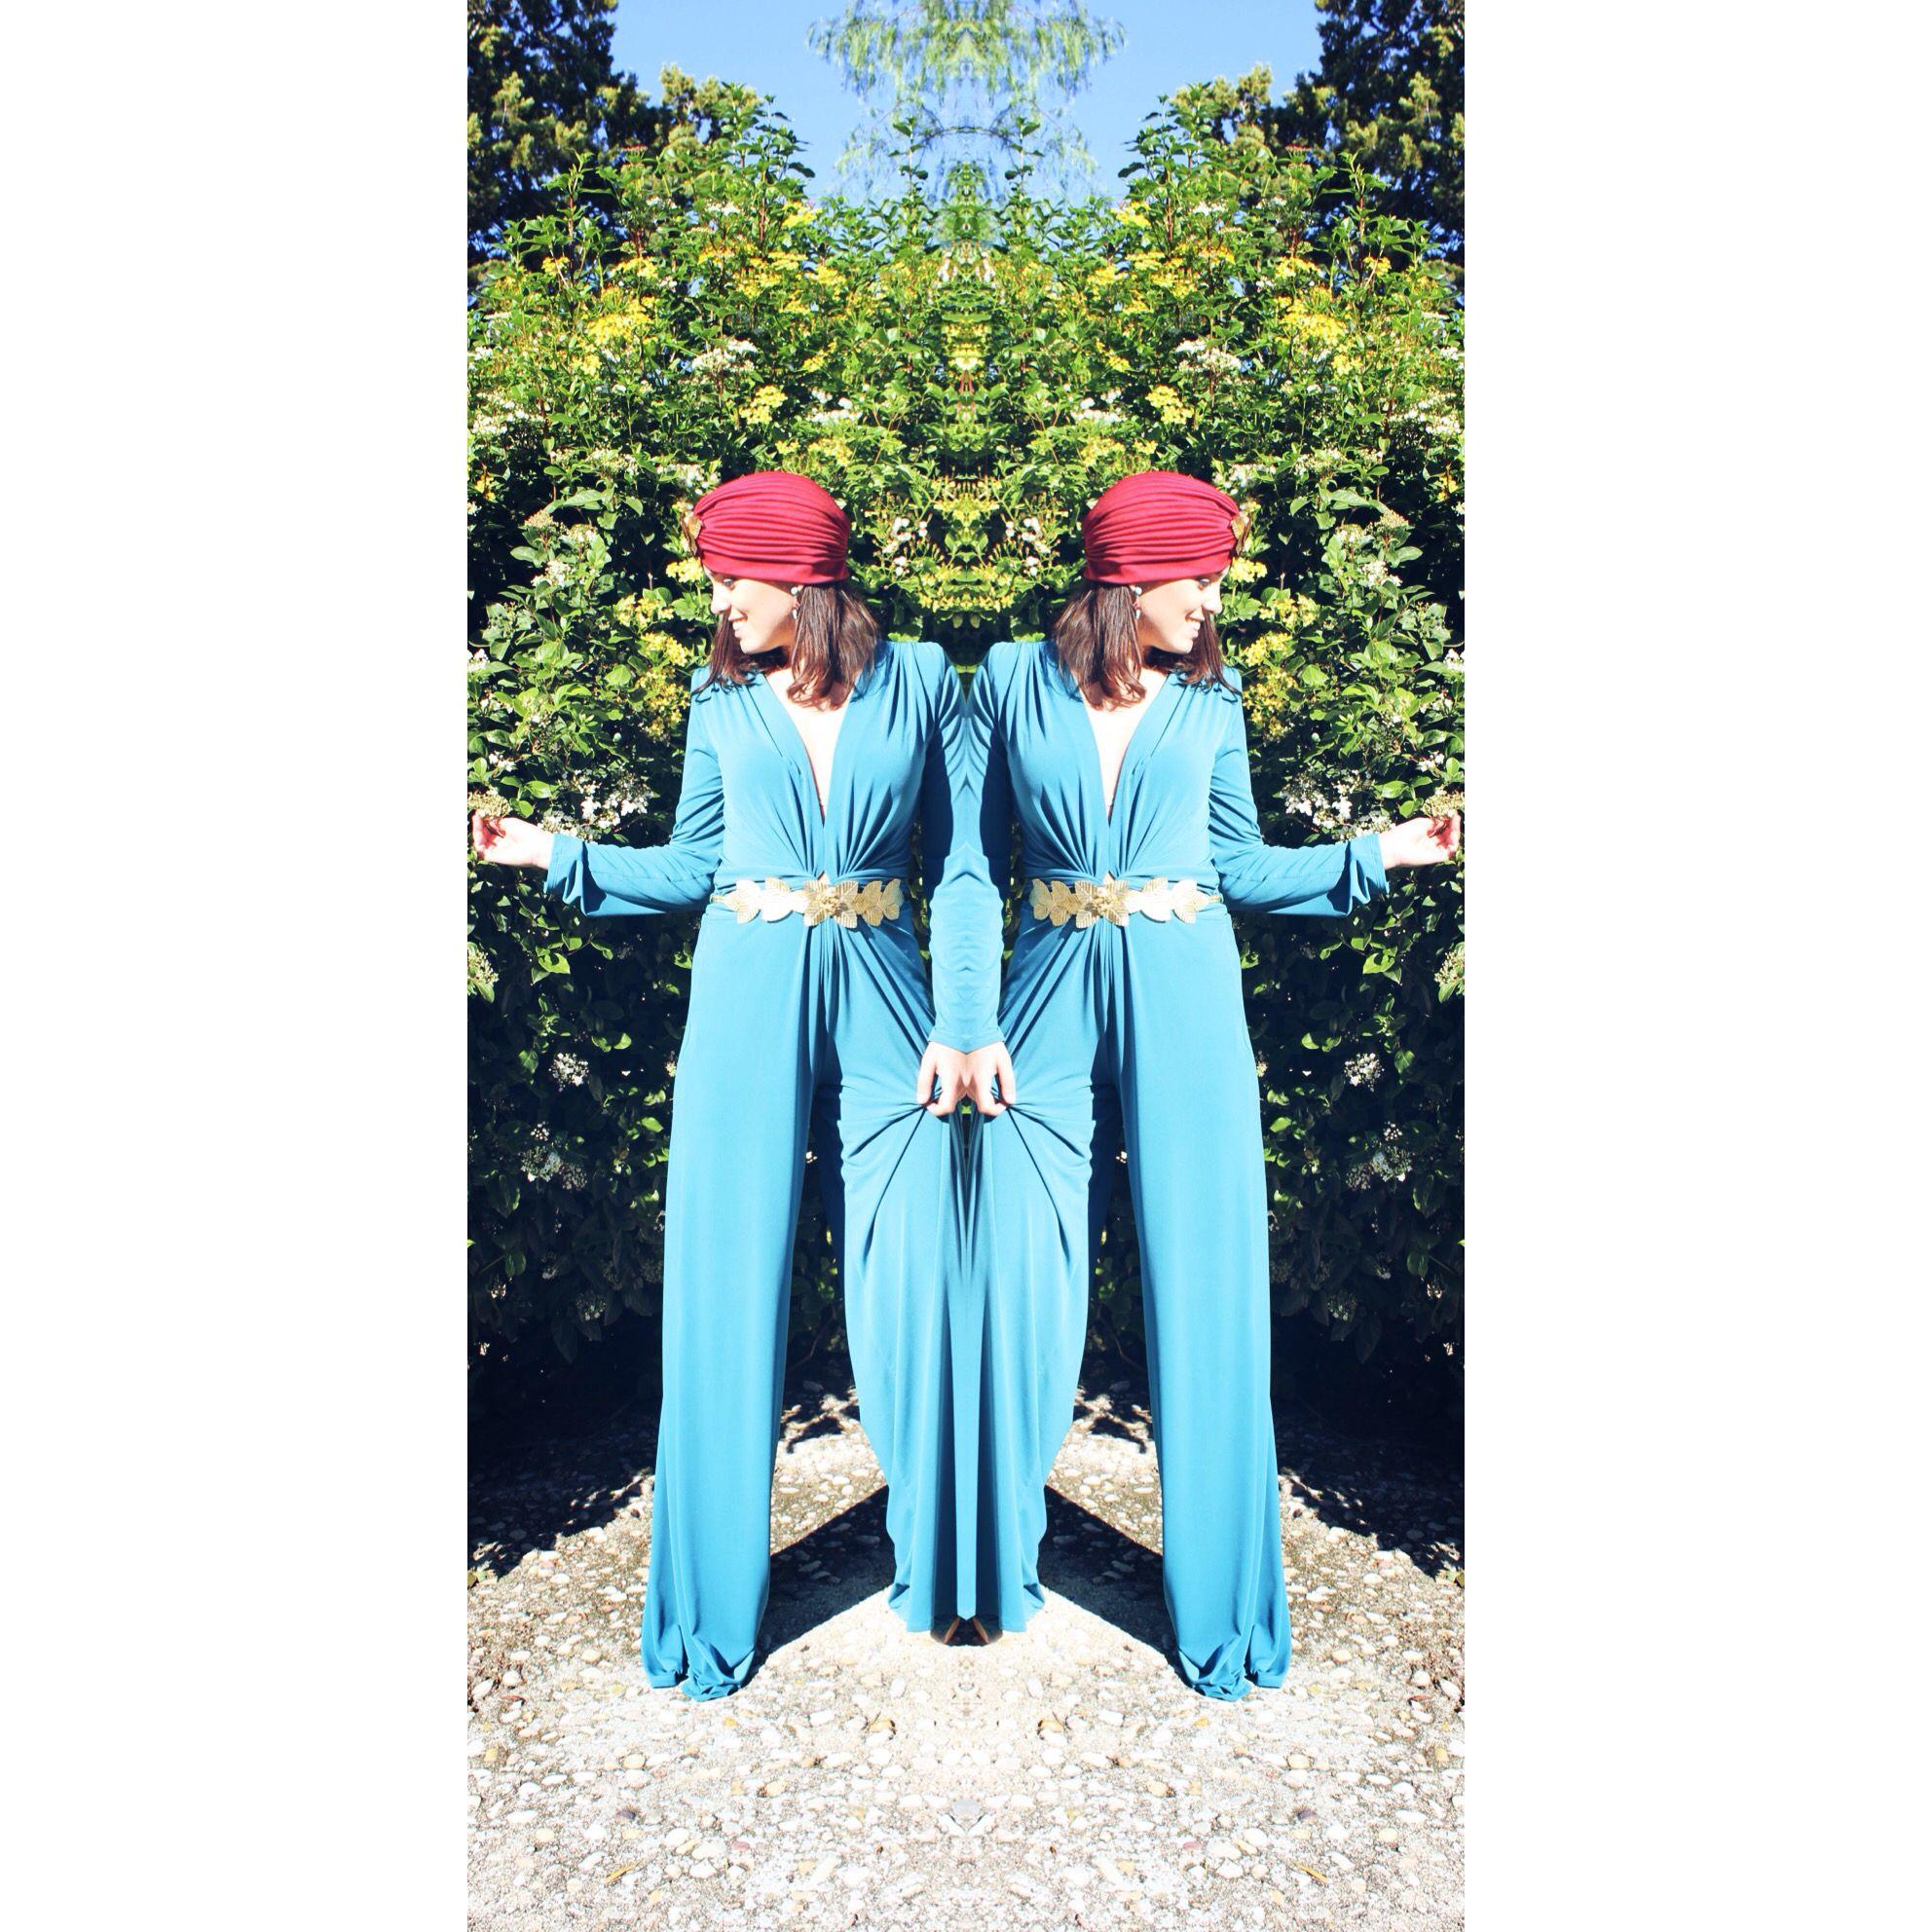 #invitadaPerfecta con #totallook by #BualáDesign atelier #mono #turbante & #cinturón hojas #pendientesJoya #lookmono